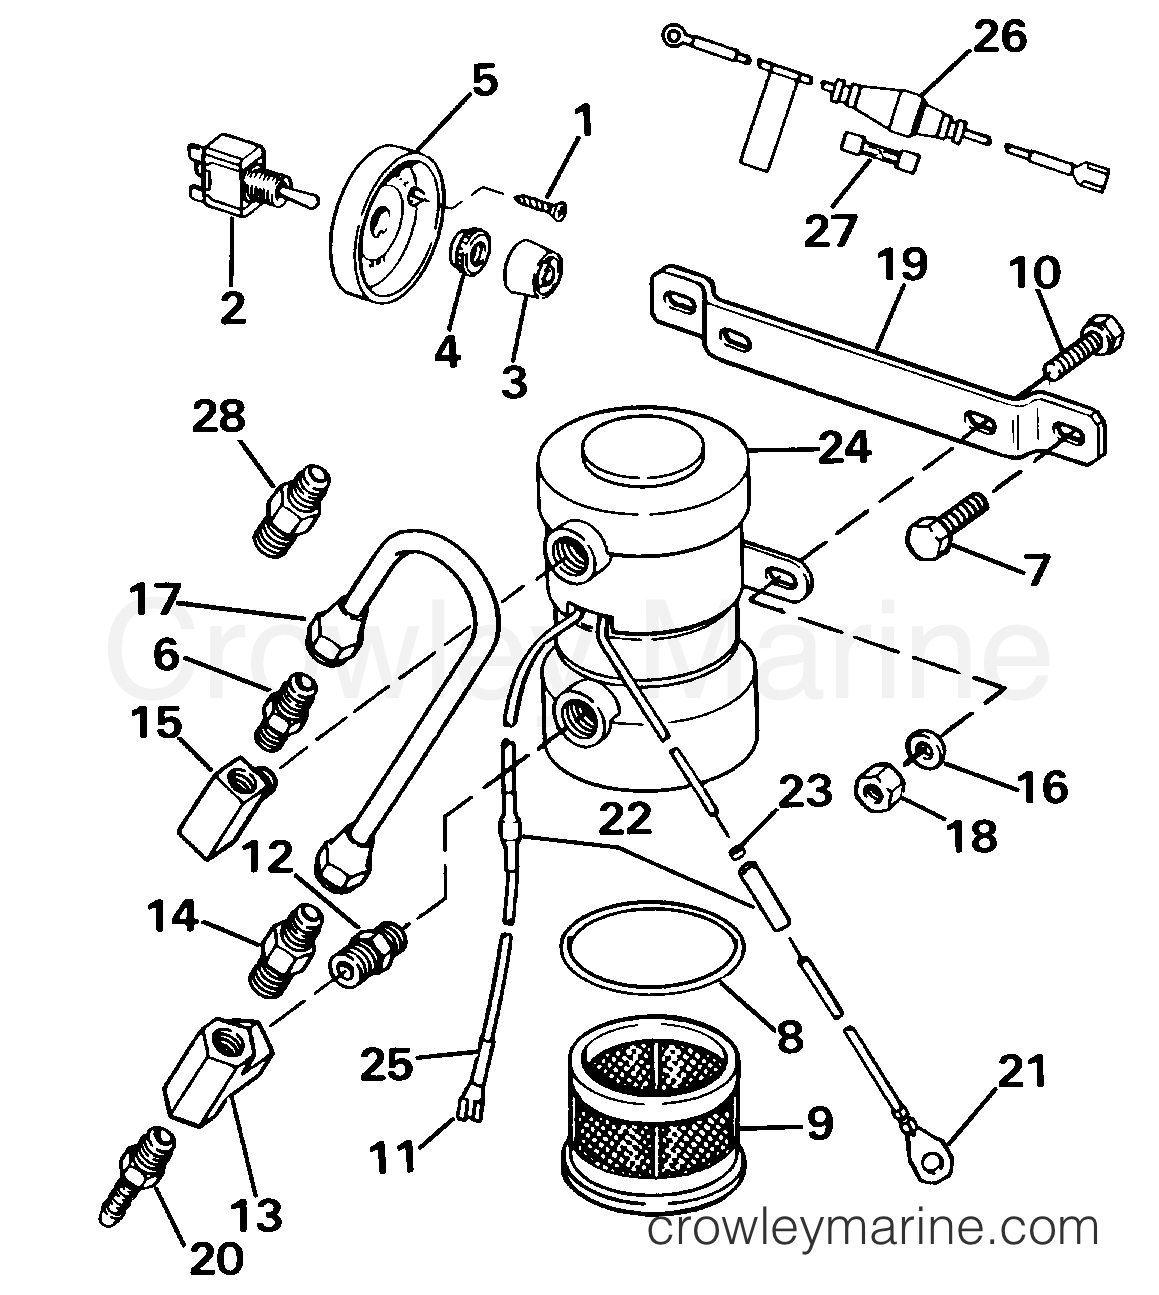 1985 Rigging Parts Accessories - Fuel System - ELECTRIC PRIMER PUMP ASSY. V-4, V-6, V-8 & SEA DRIVE